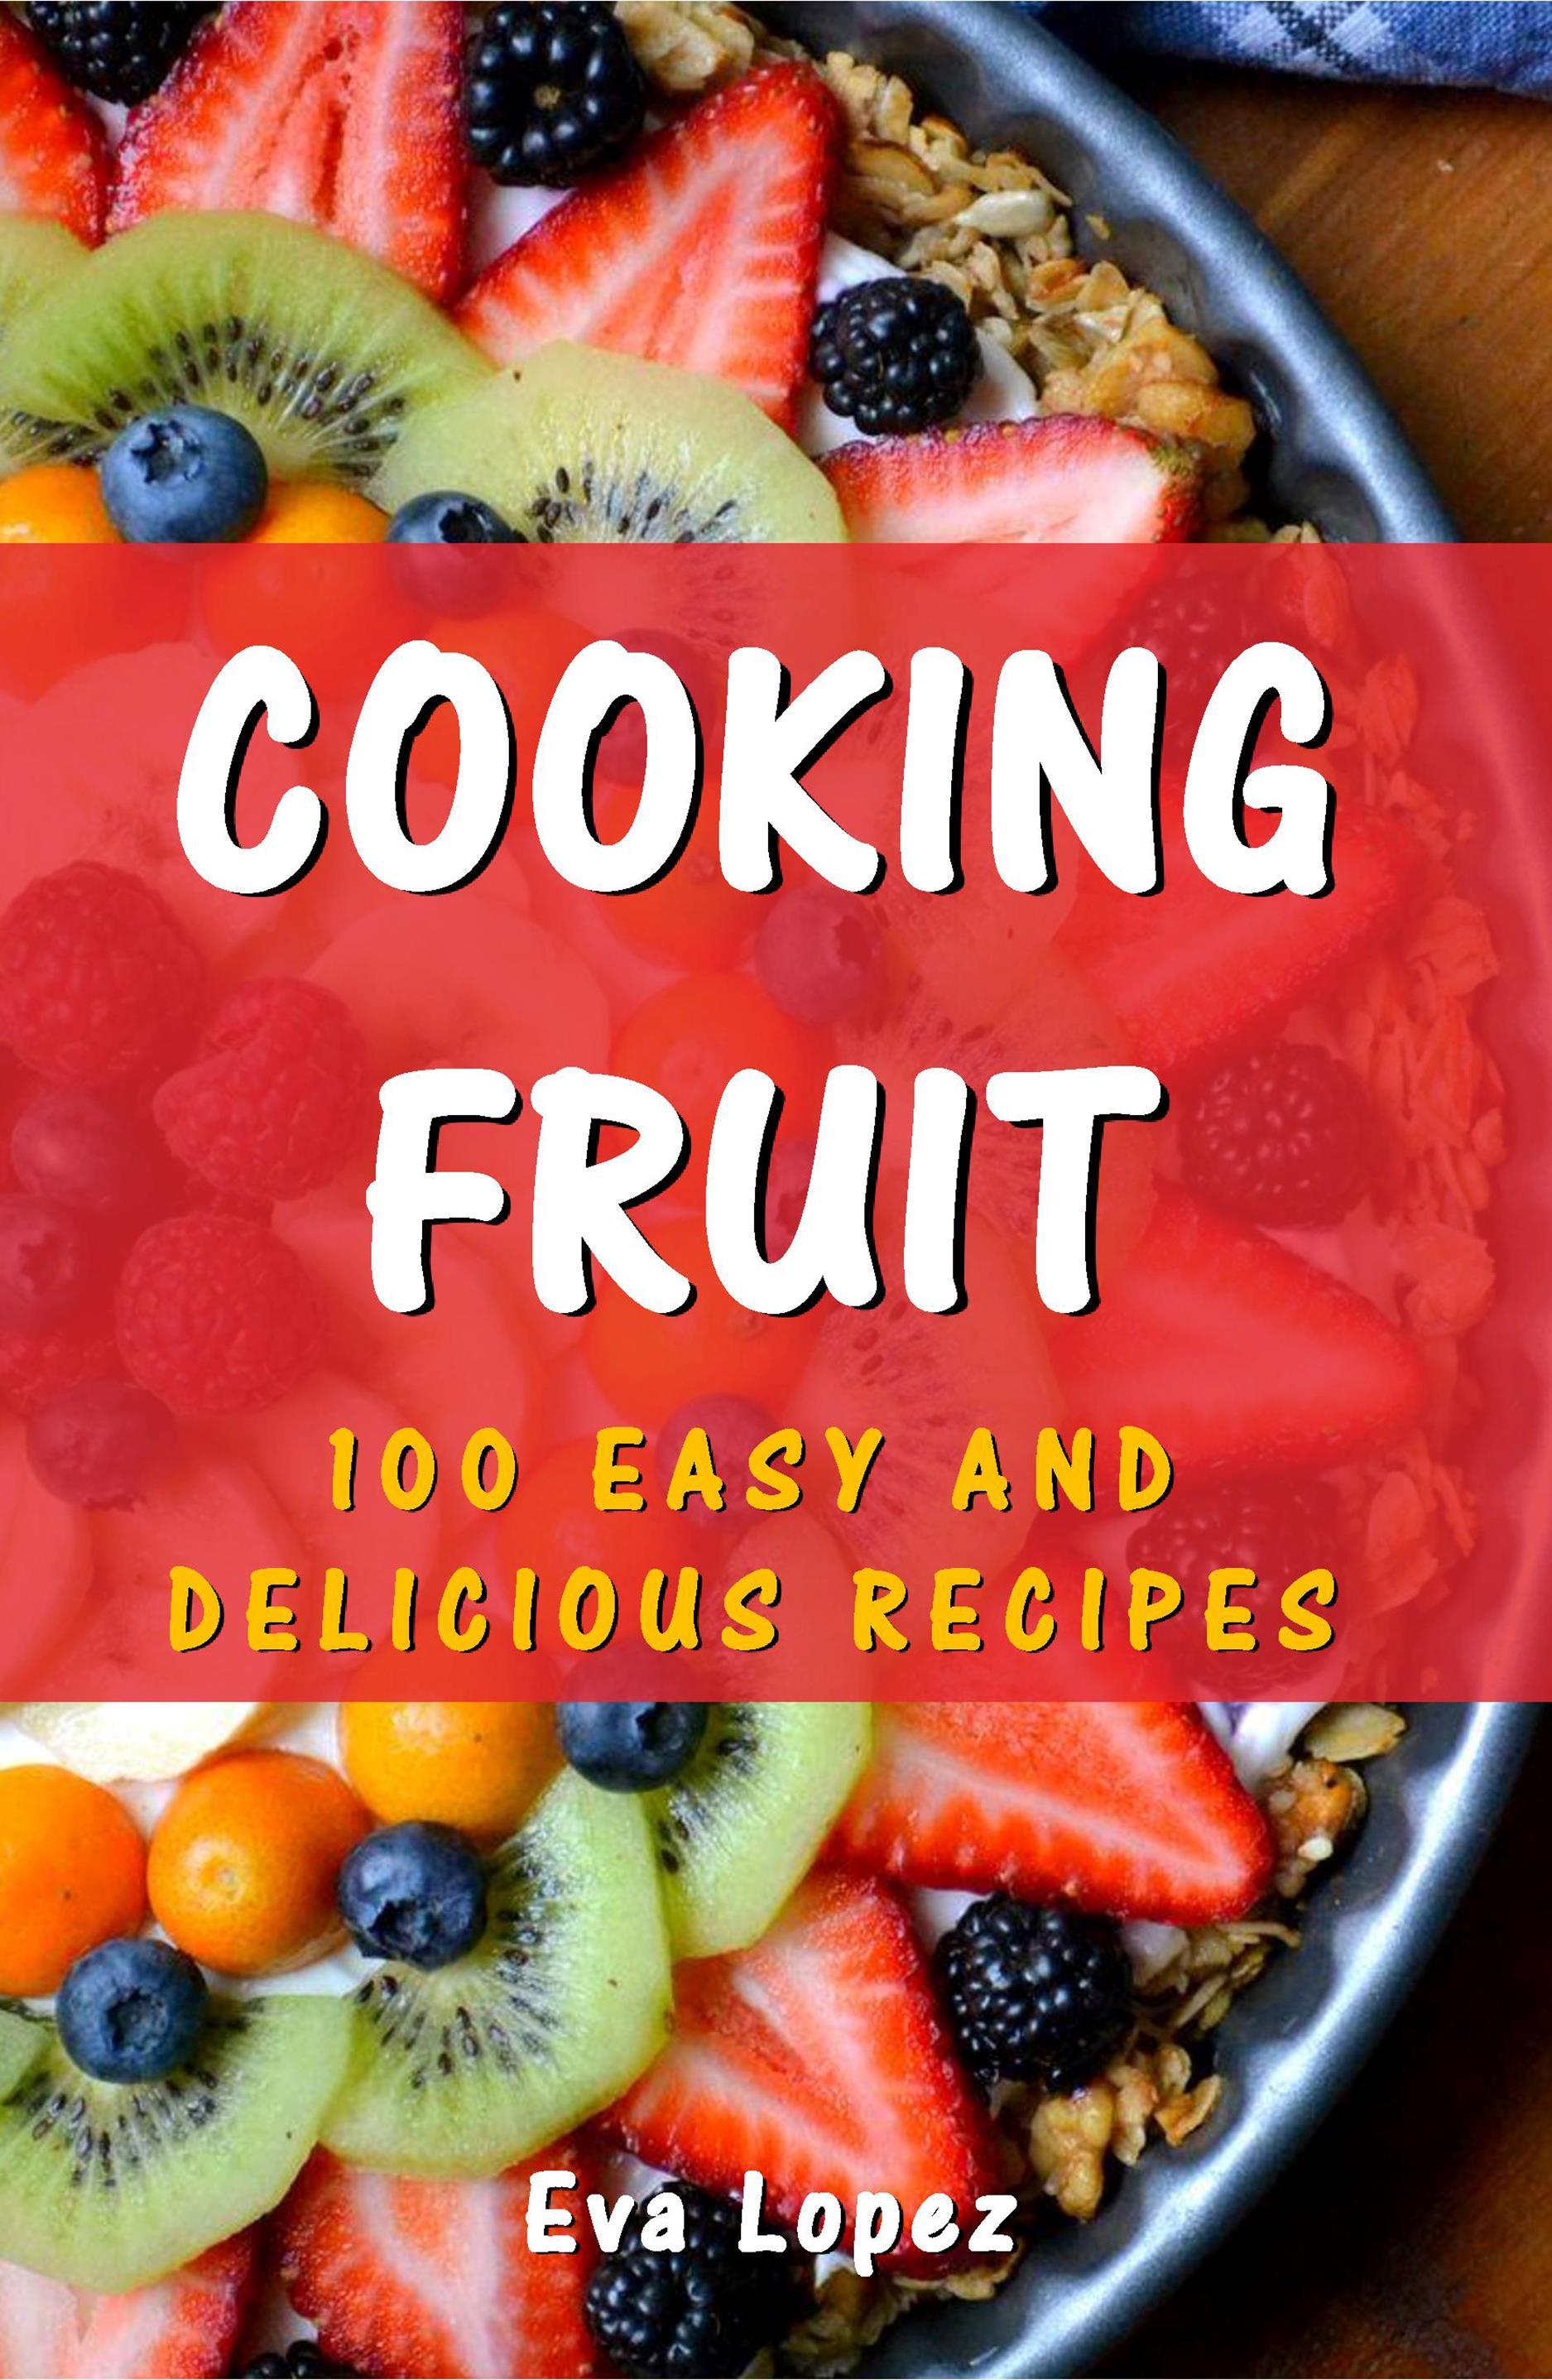 Cooking Fruit